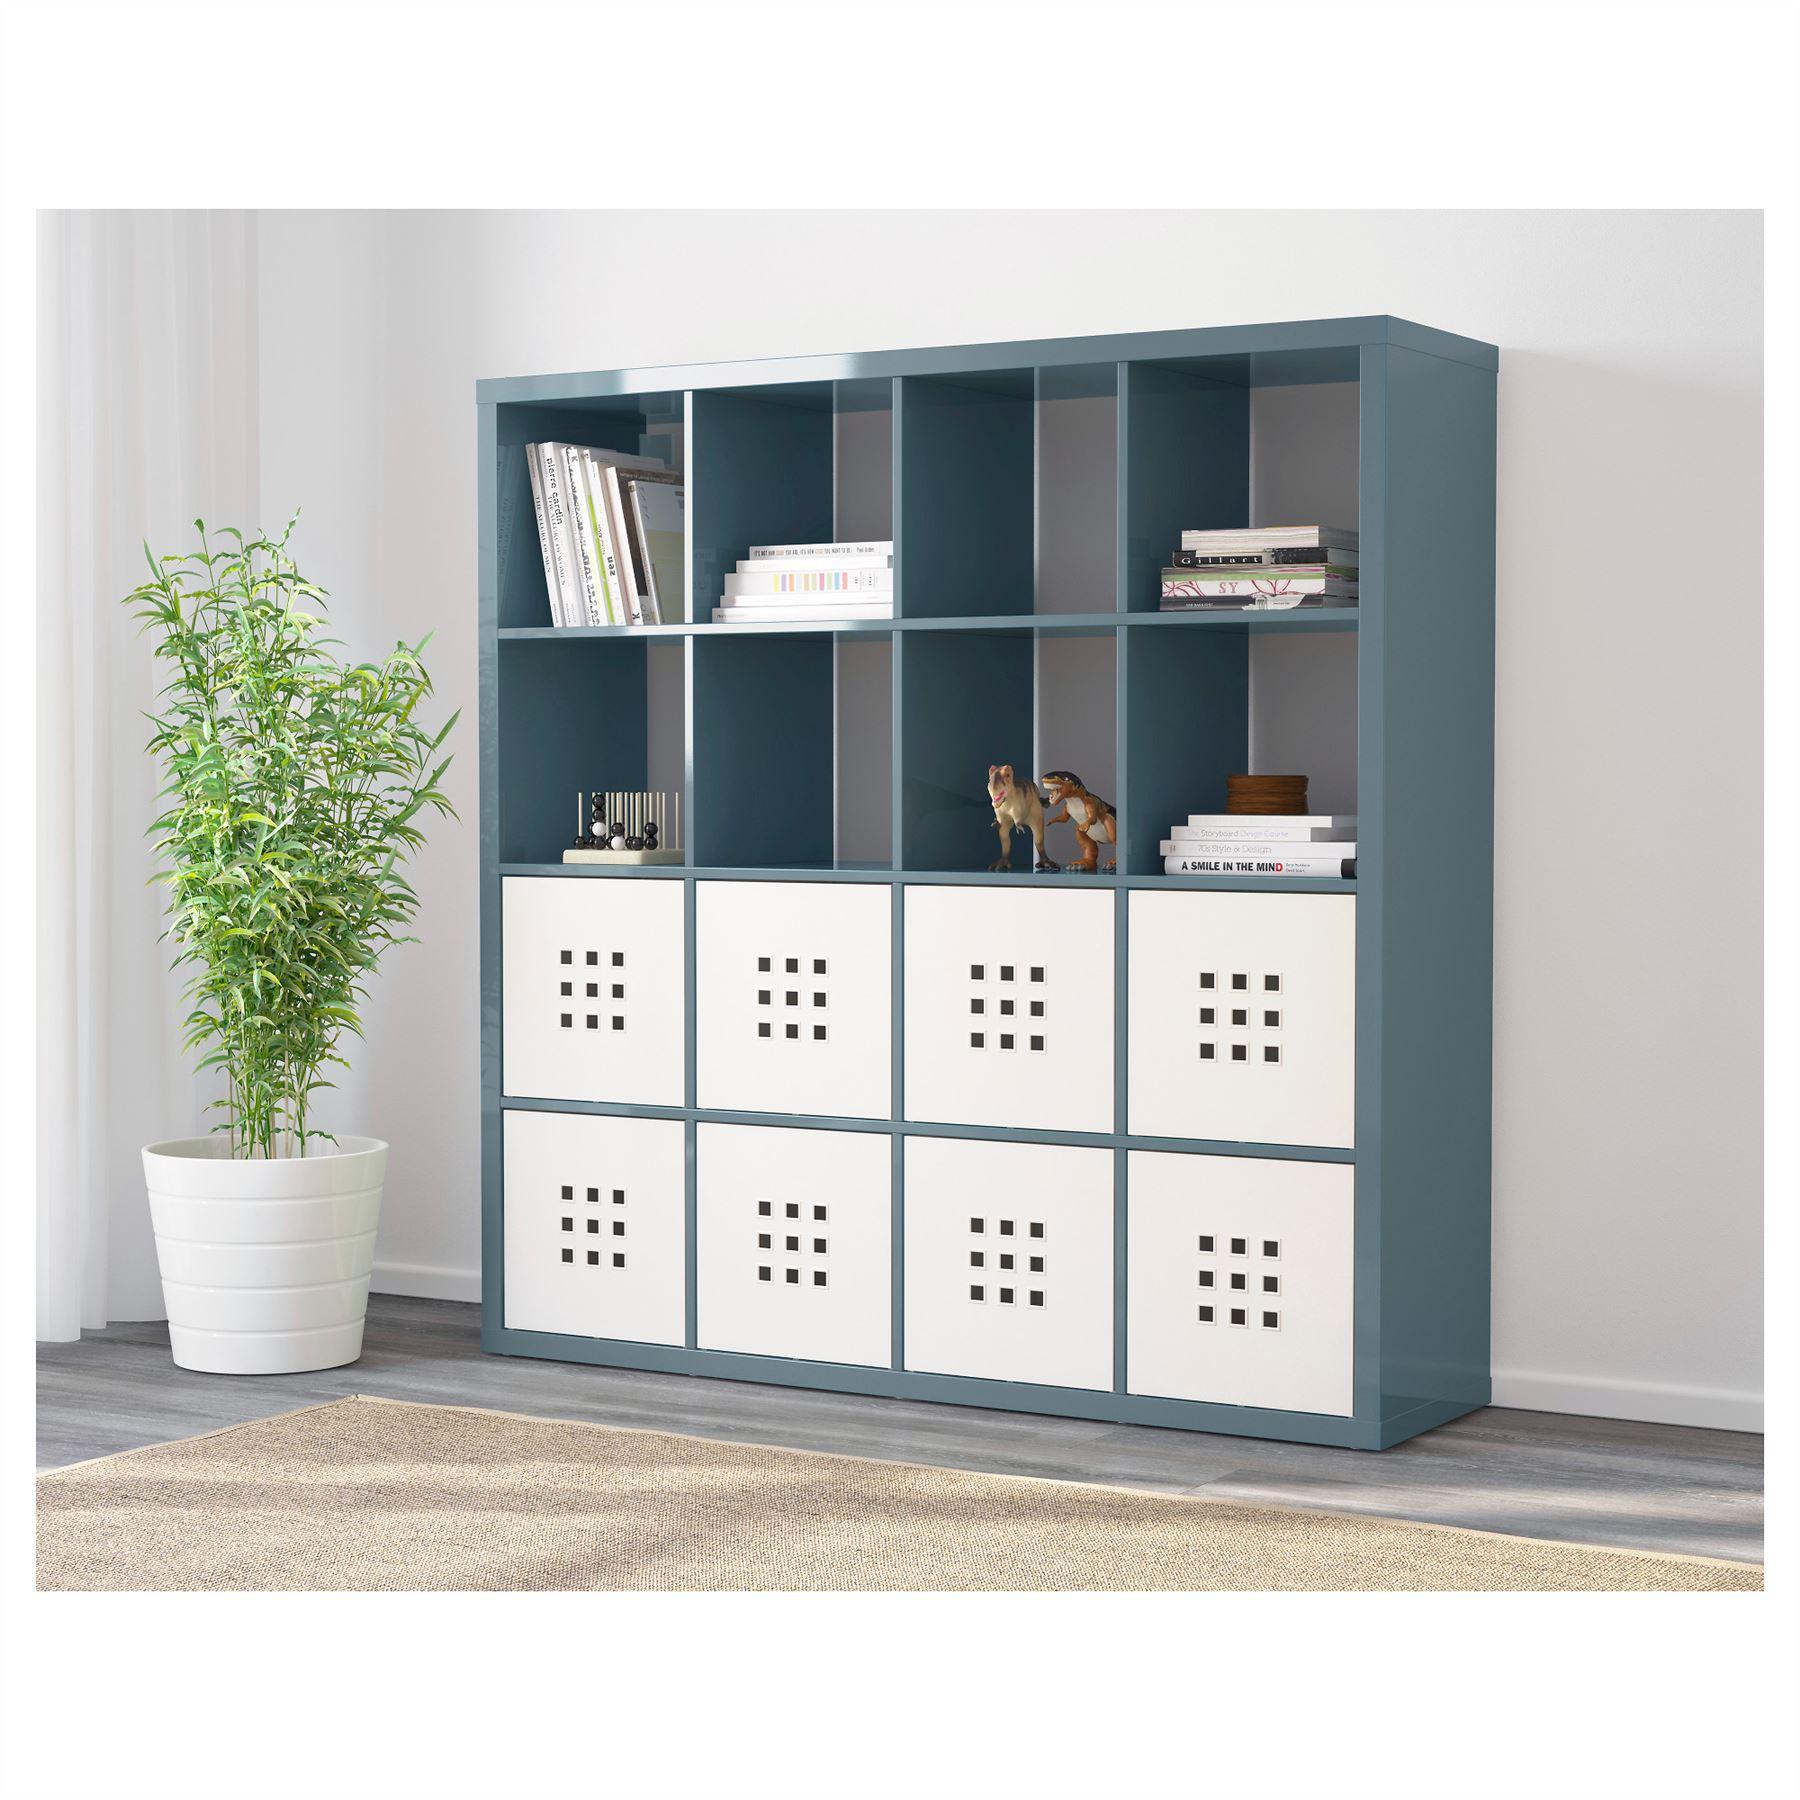 Ikea Bookshelves Gray Bestar Pro Linea Shelf Bookcase Bark Grey